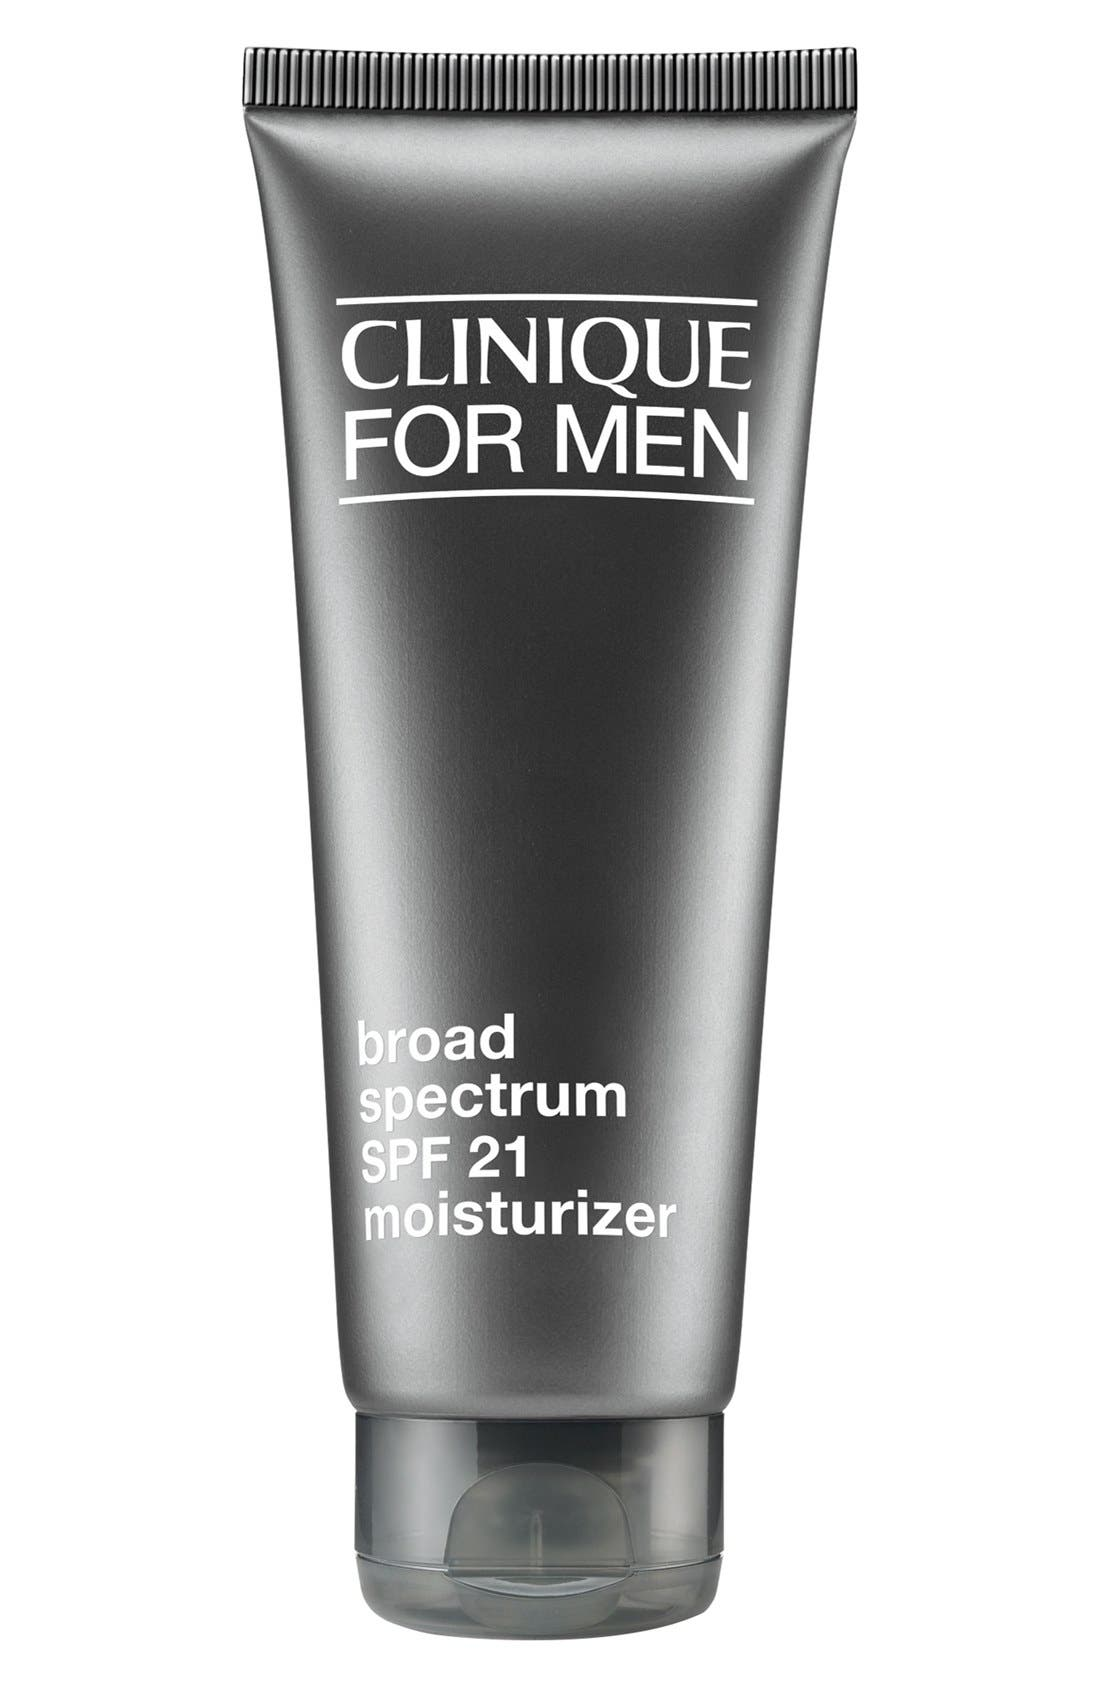 Clinique for Men Broad Spectrum SPF 21 Moisturizer